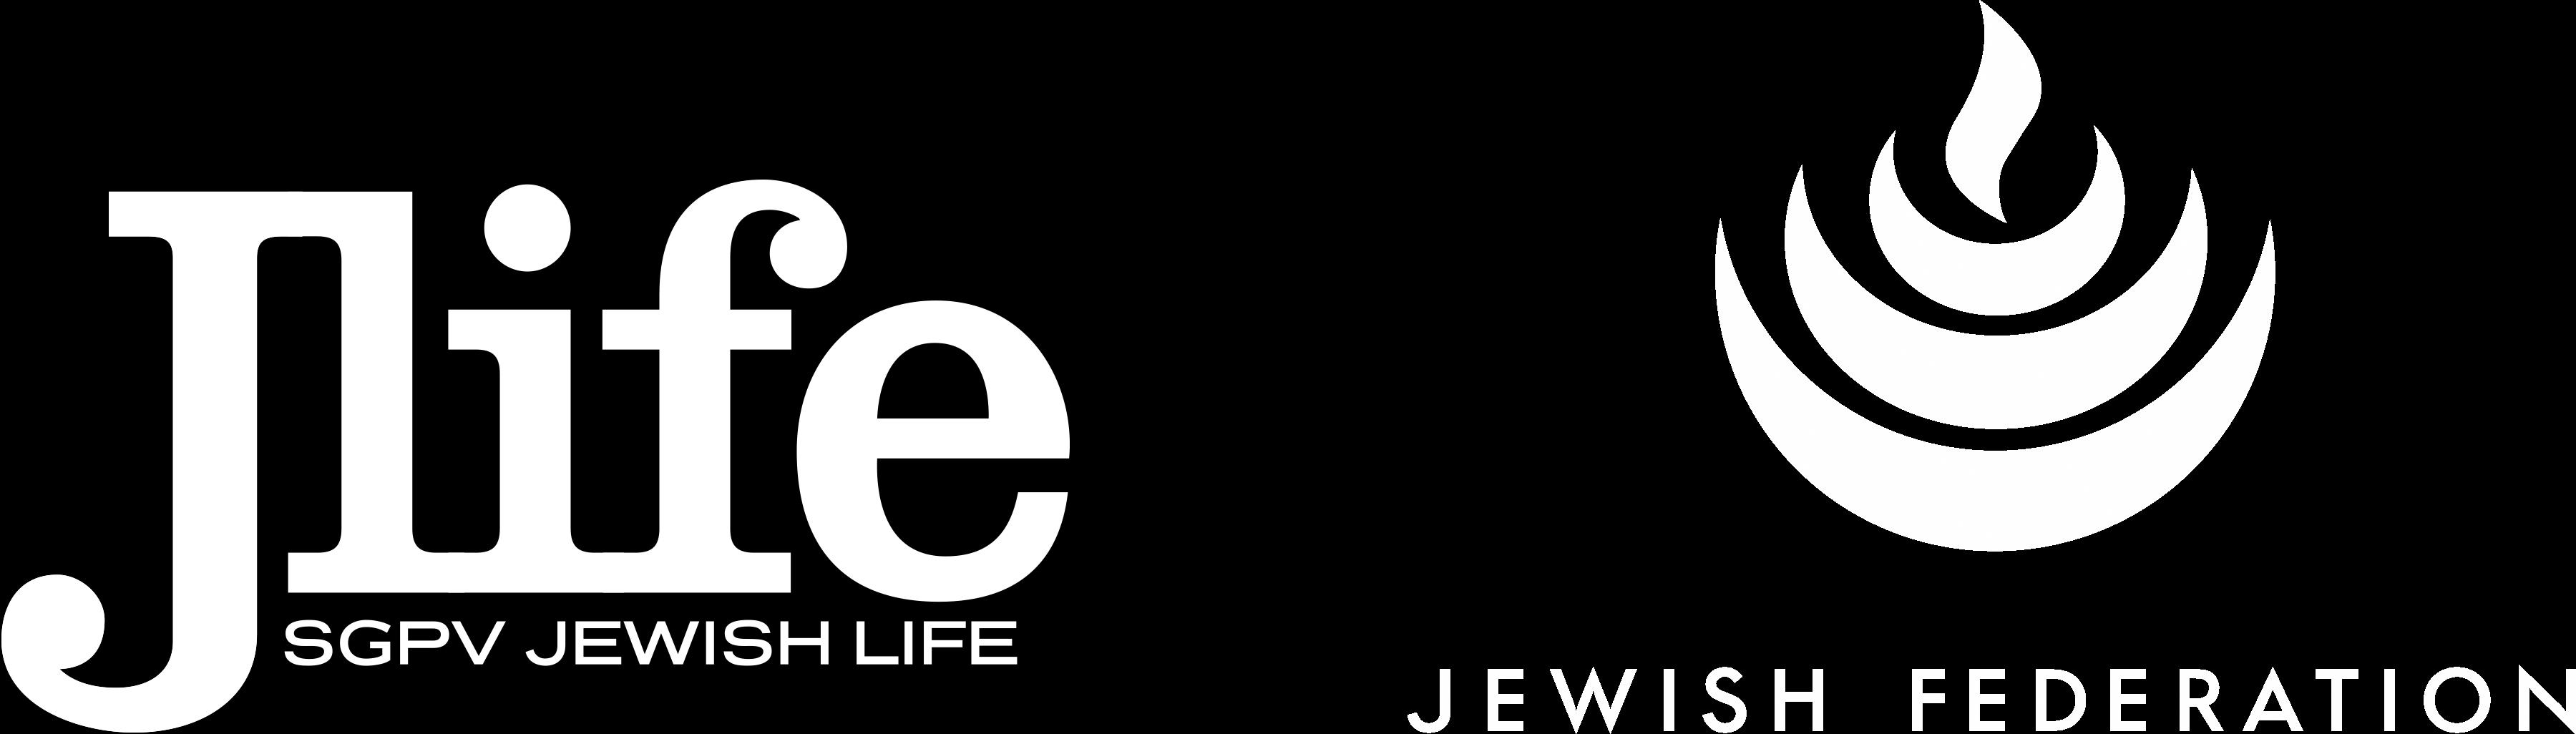 Jlife SGPV Logo